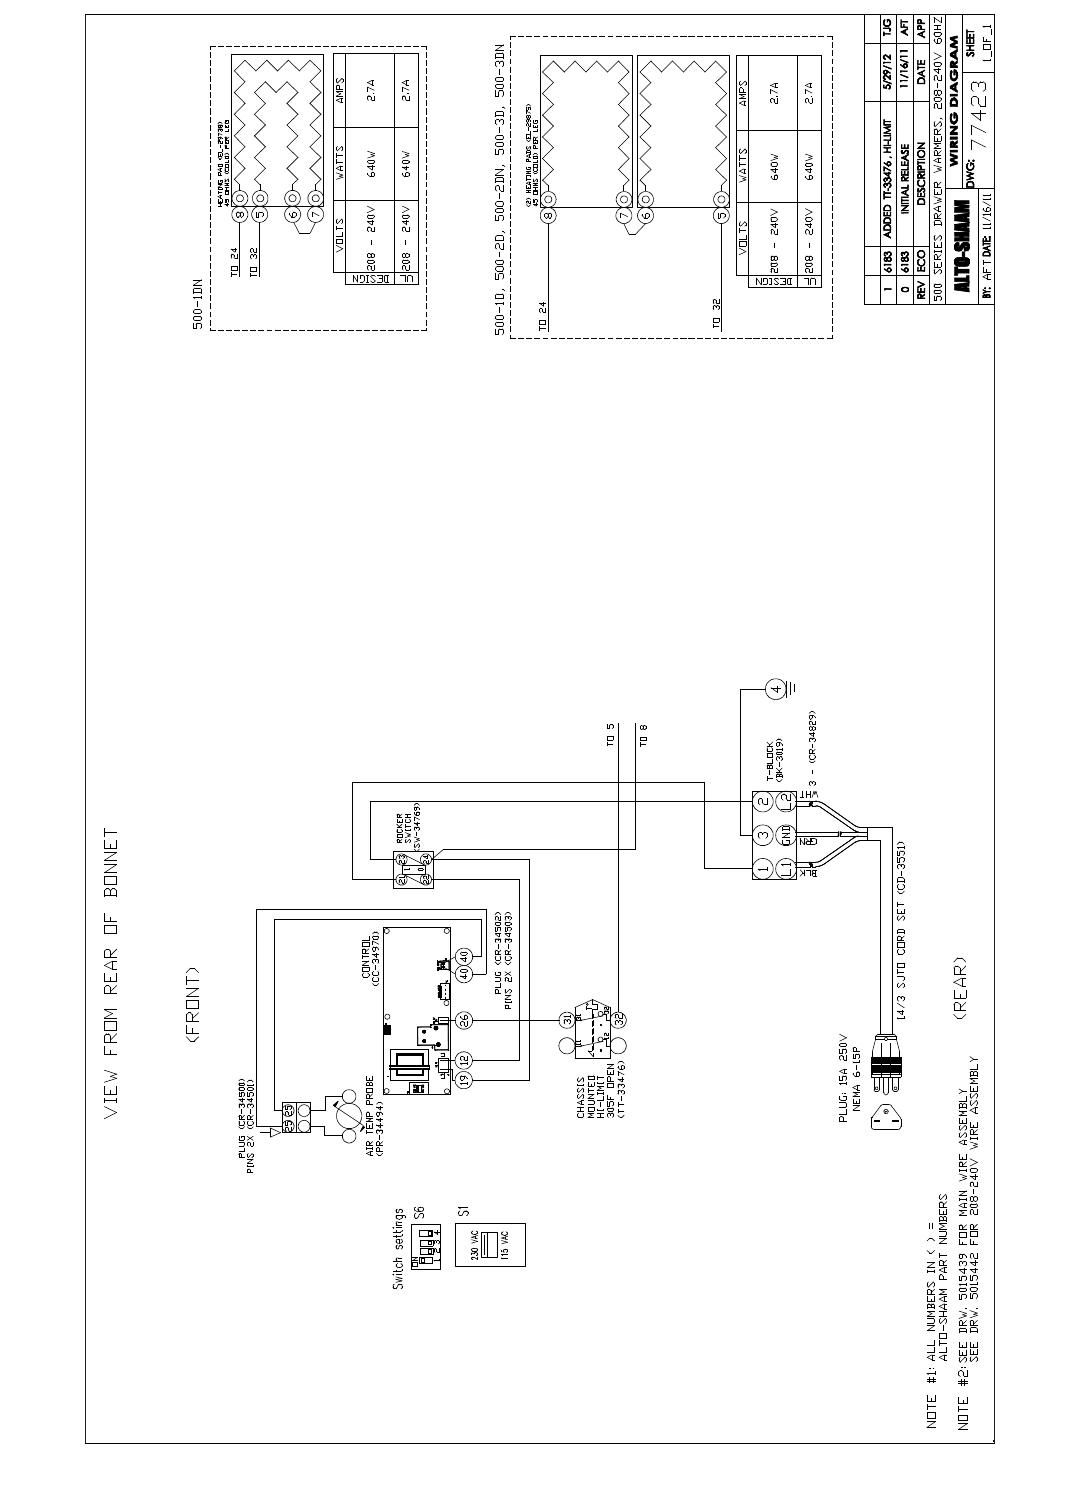 [SCHEMATICS_49CH]  Alto Shaam 1Dn Users Manual | Alto Shaam Wiring Diagram |  | UserManual.wiki